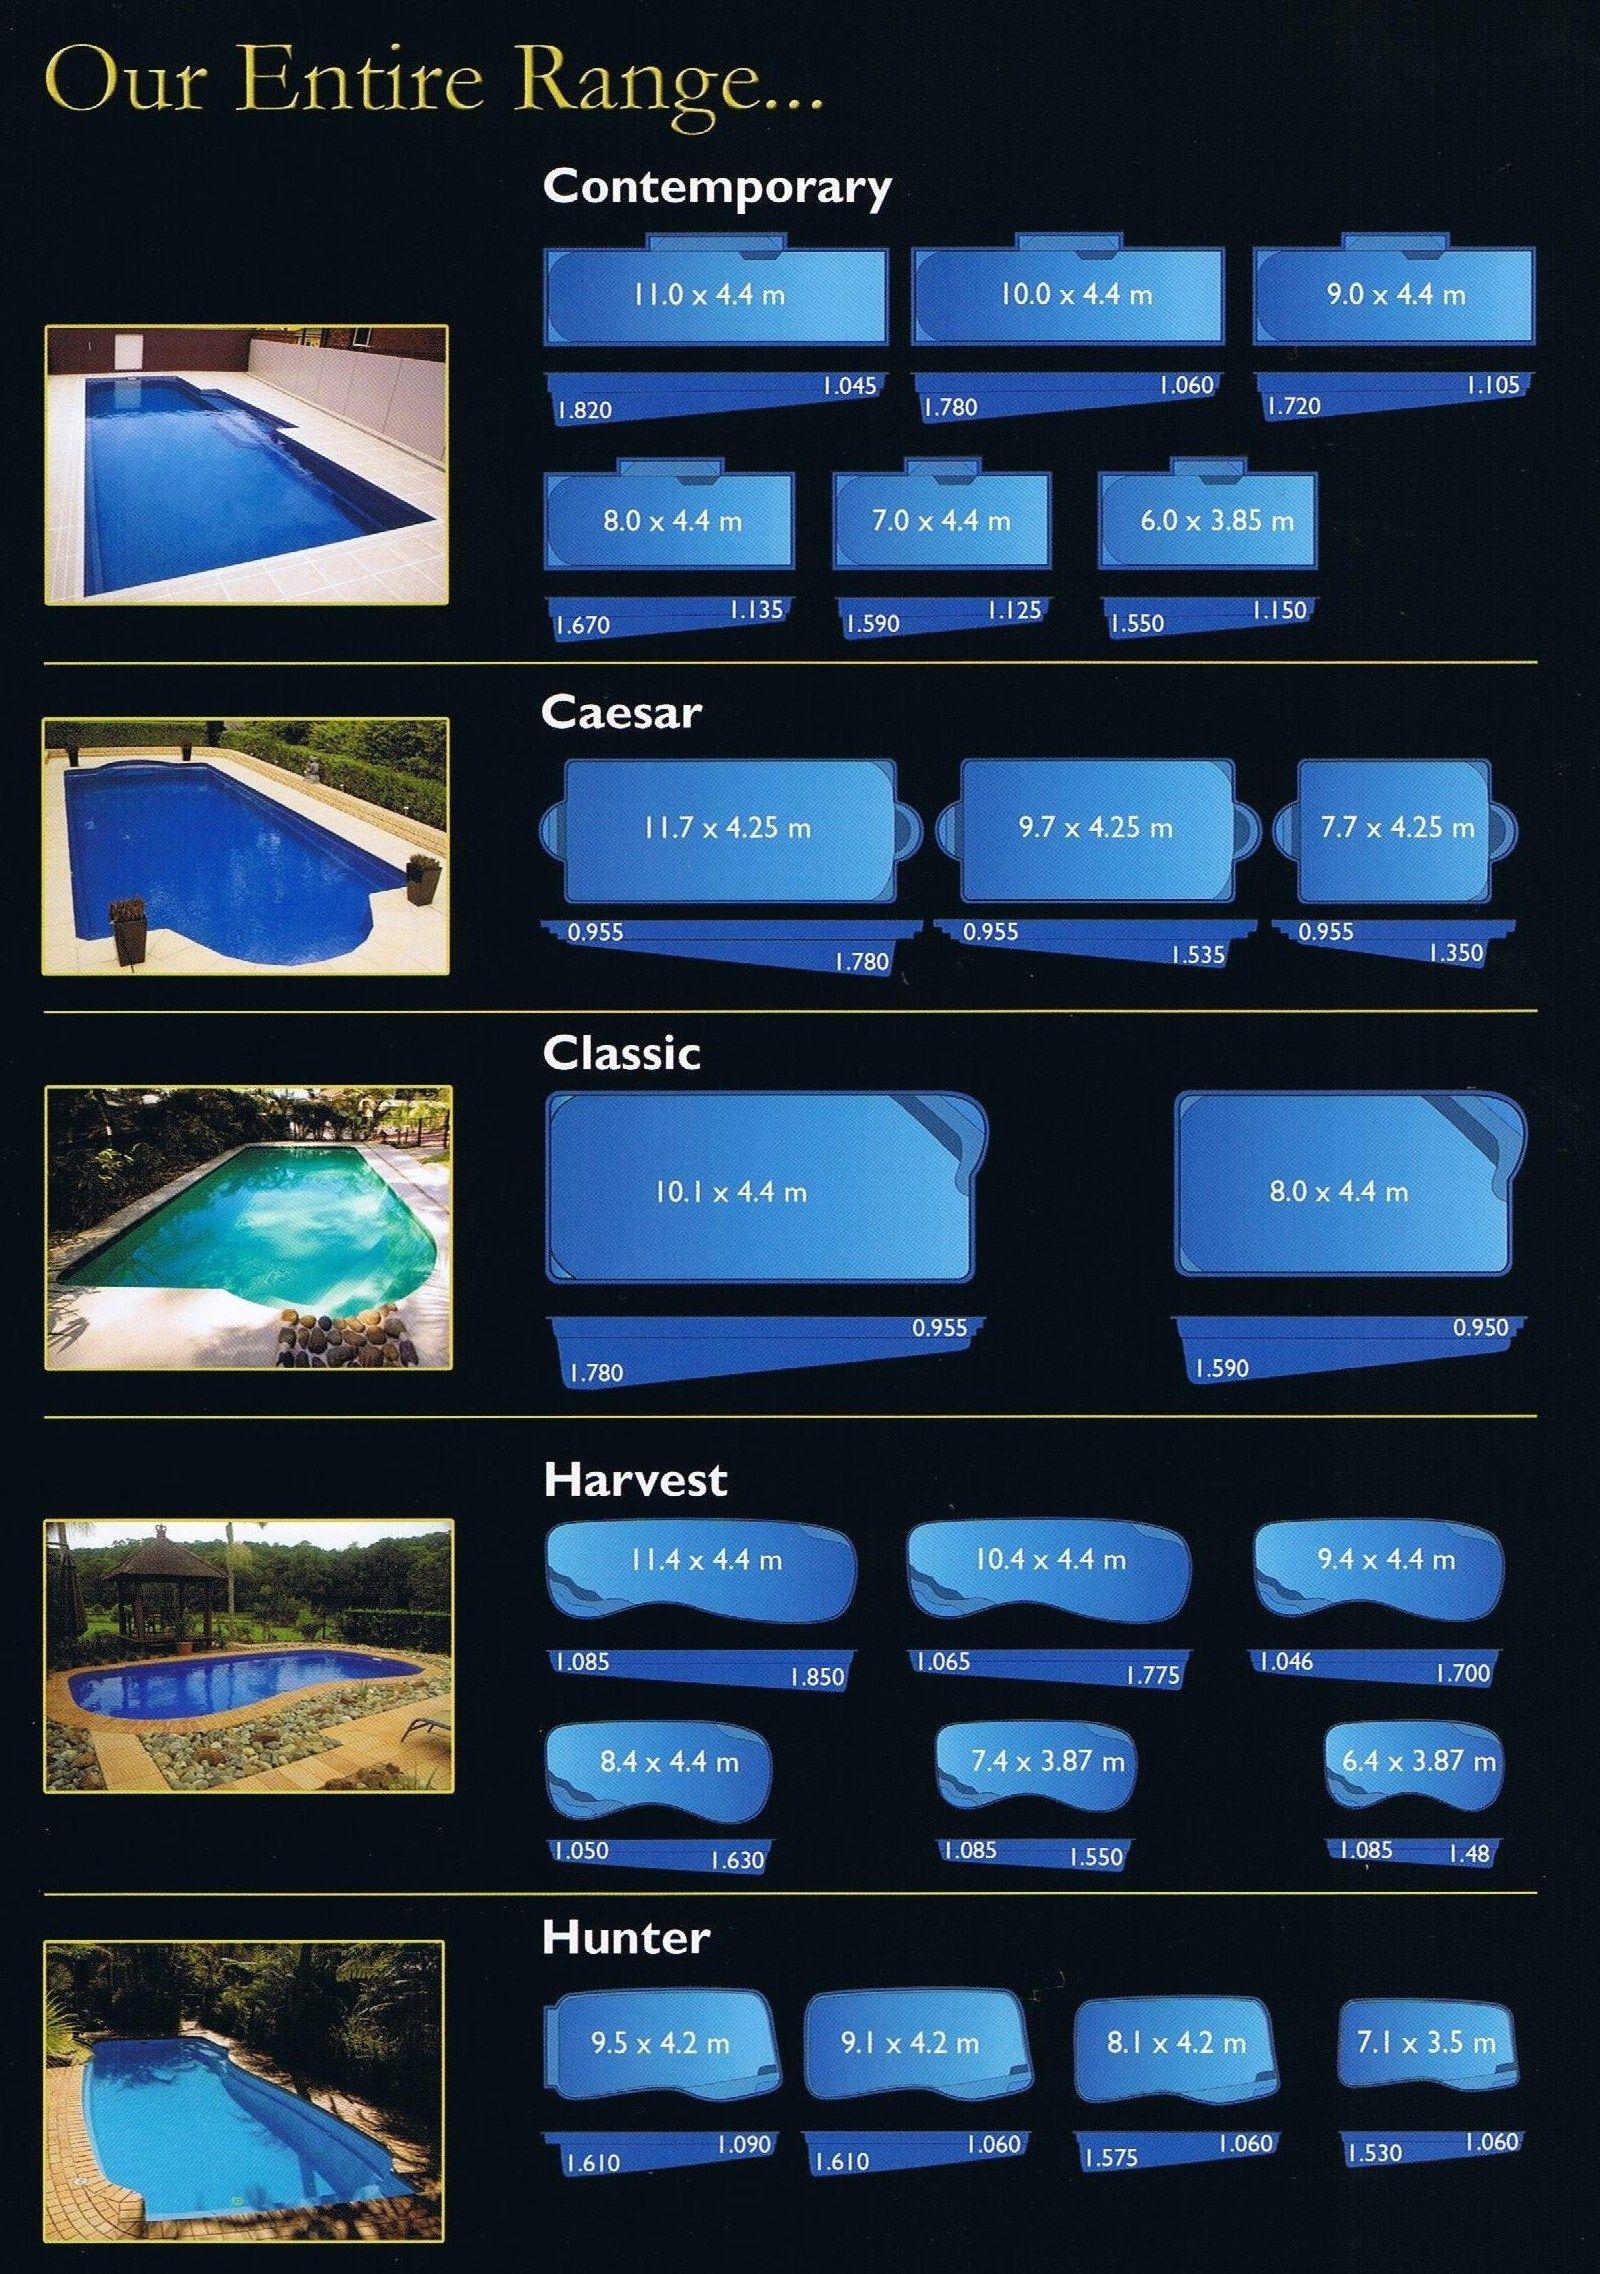 Pool Range Fiberglass Swimming Pools Sydney Fibreglass Swimming Pools With Images Fiberglass Swimming Pools Pool Sizes Inground Swimming Pools Backyard